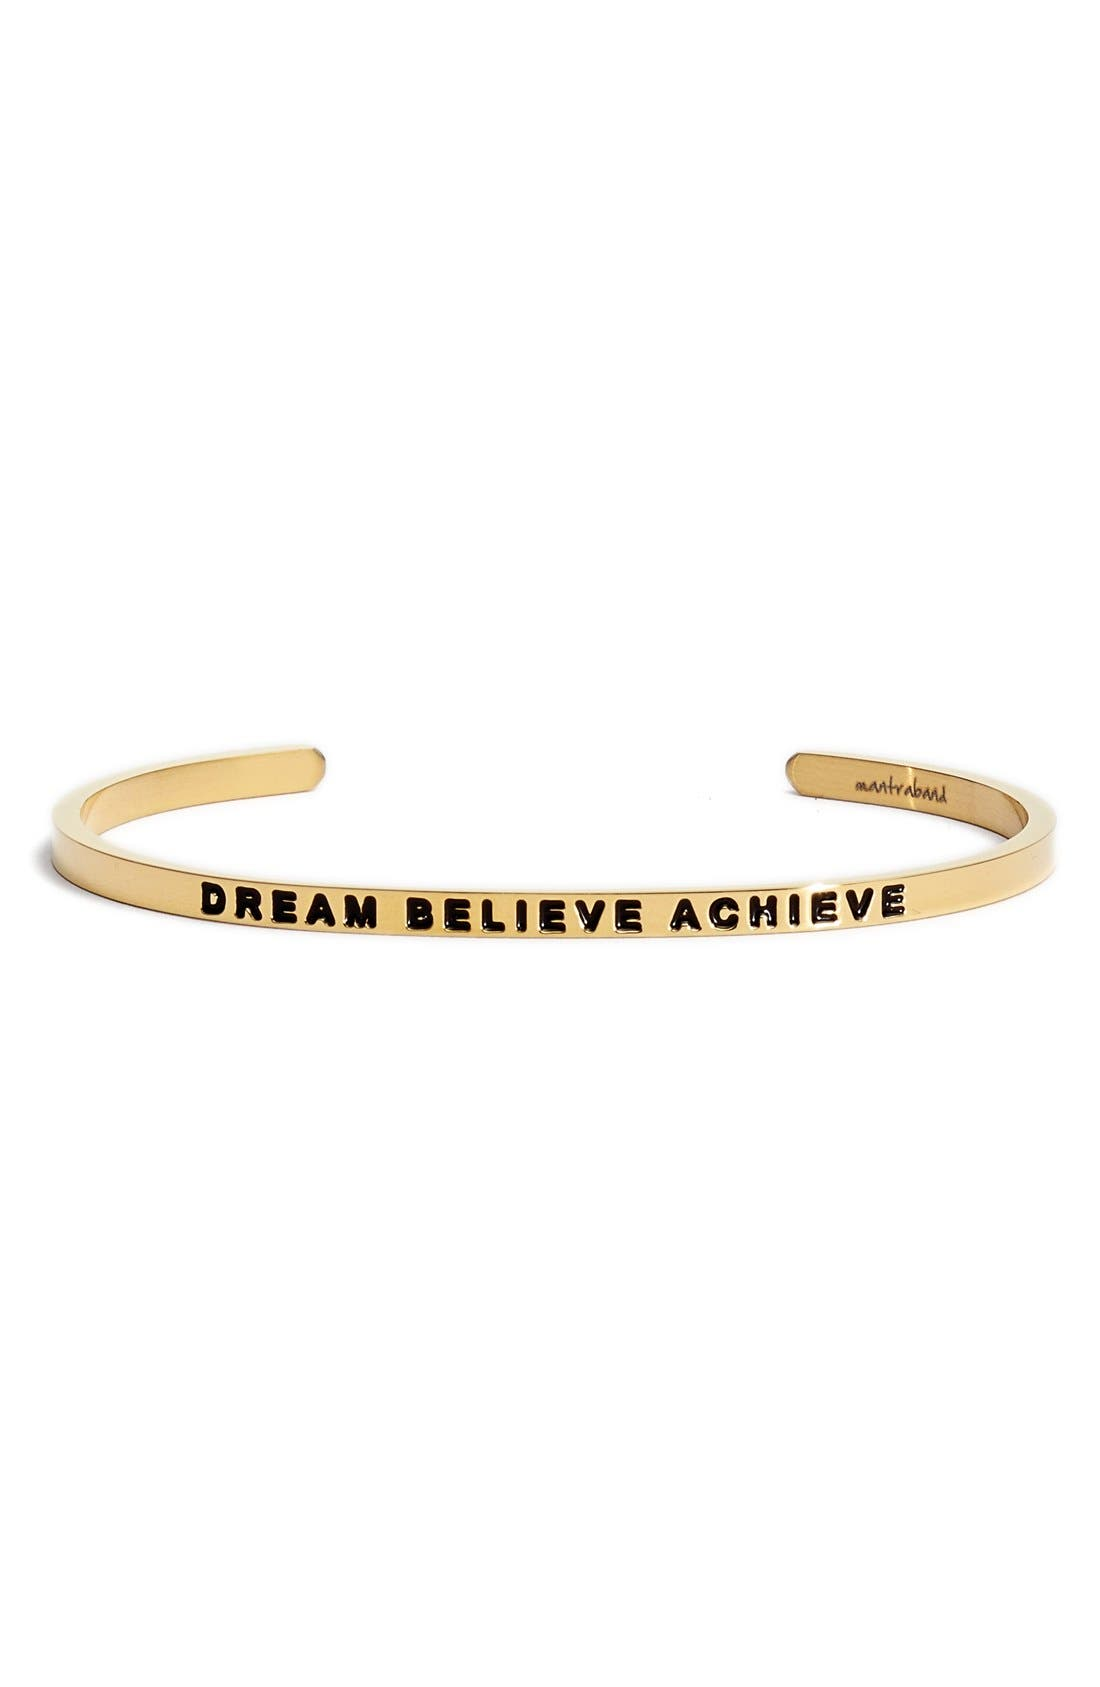 'Dream Believe Achieve' Cuff,                             Main thumbnail 1, color,                             GOLD